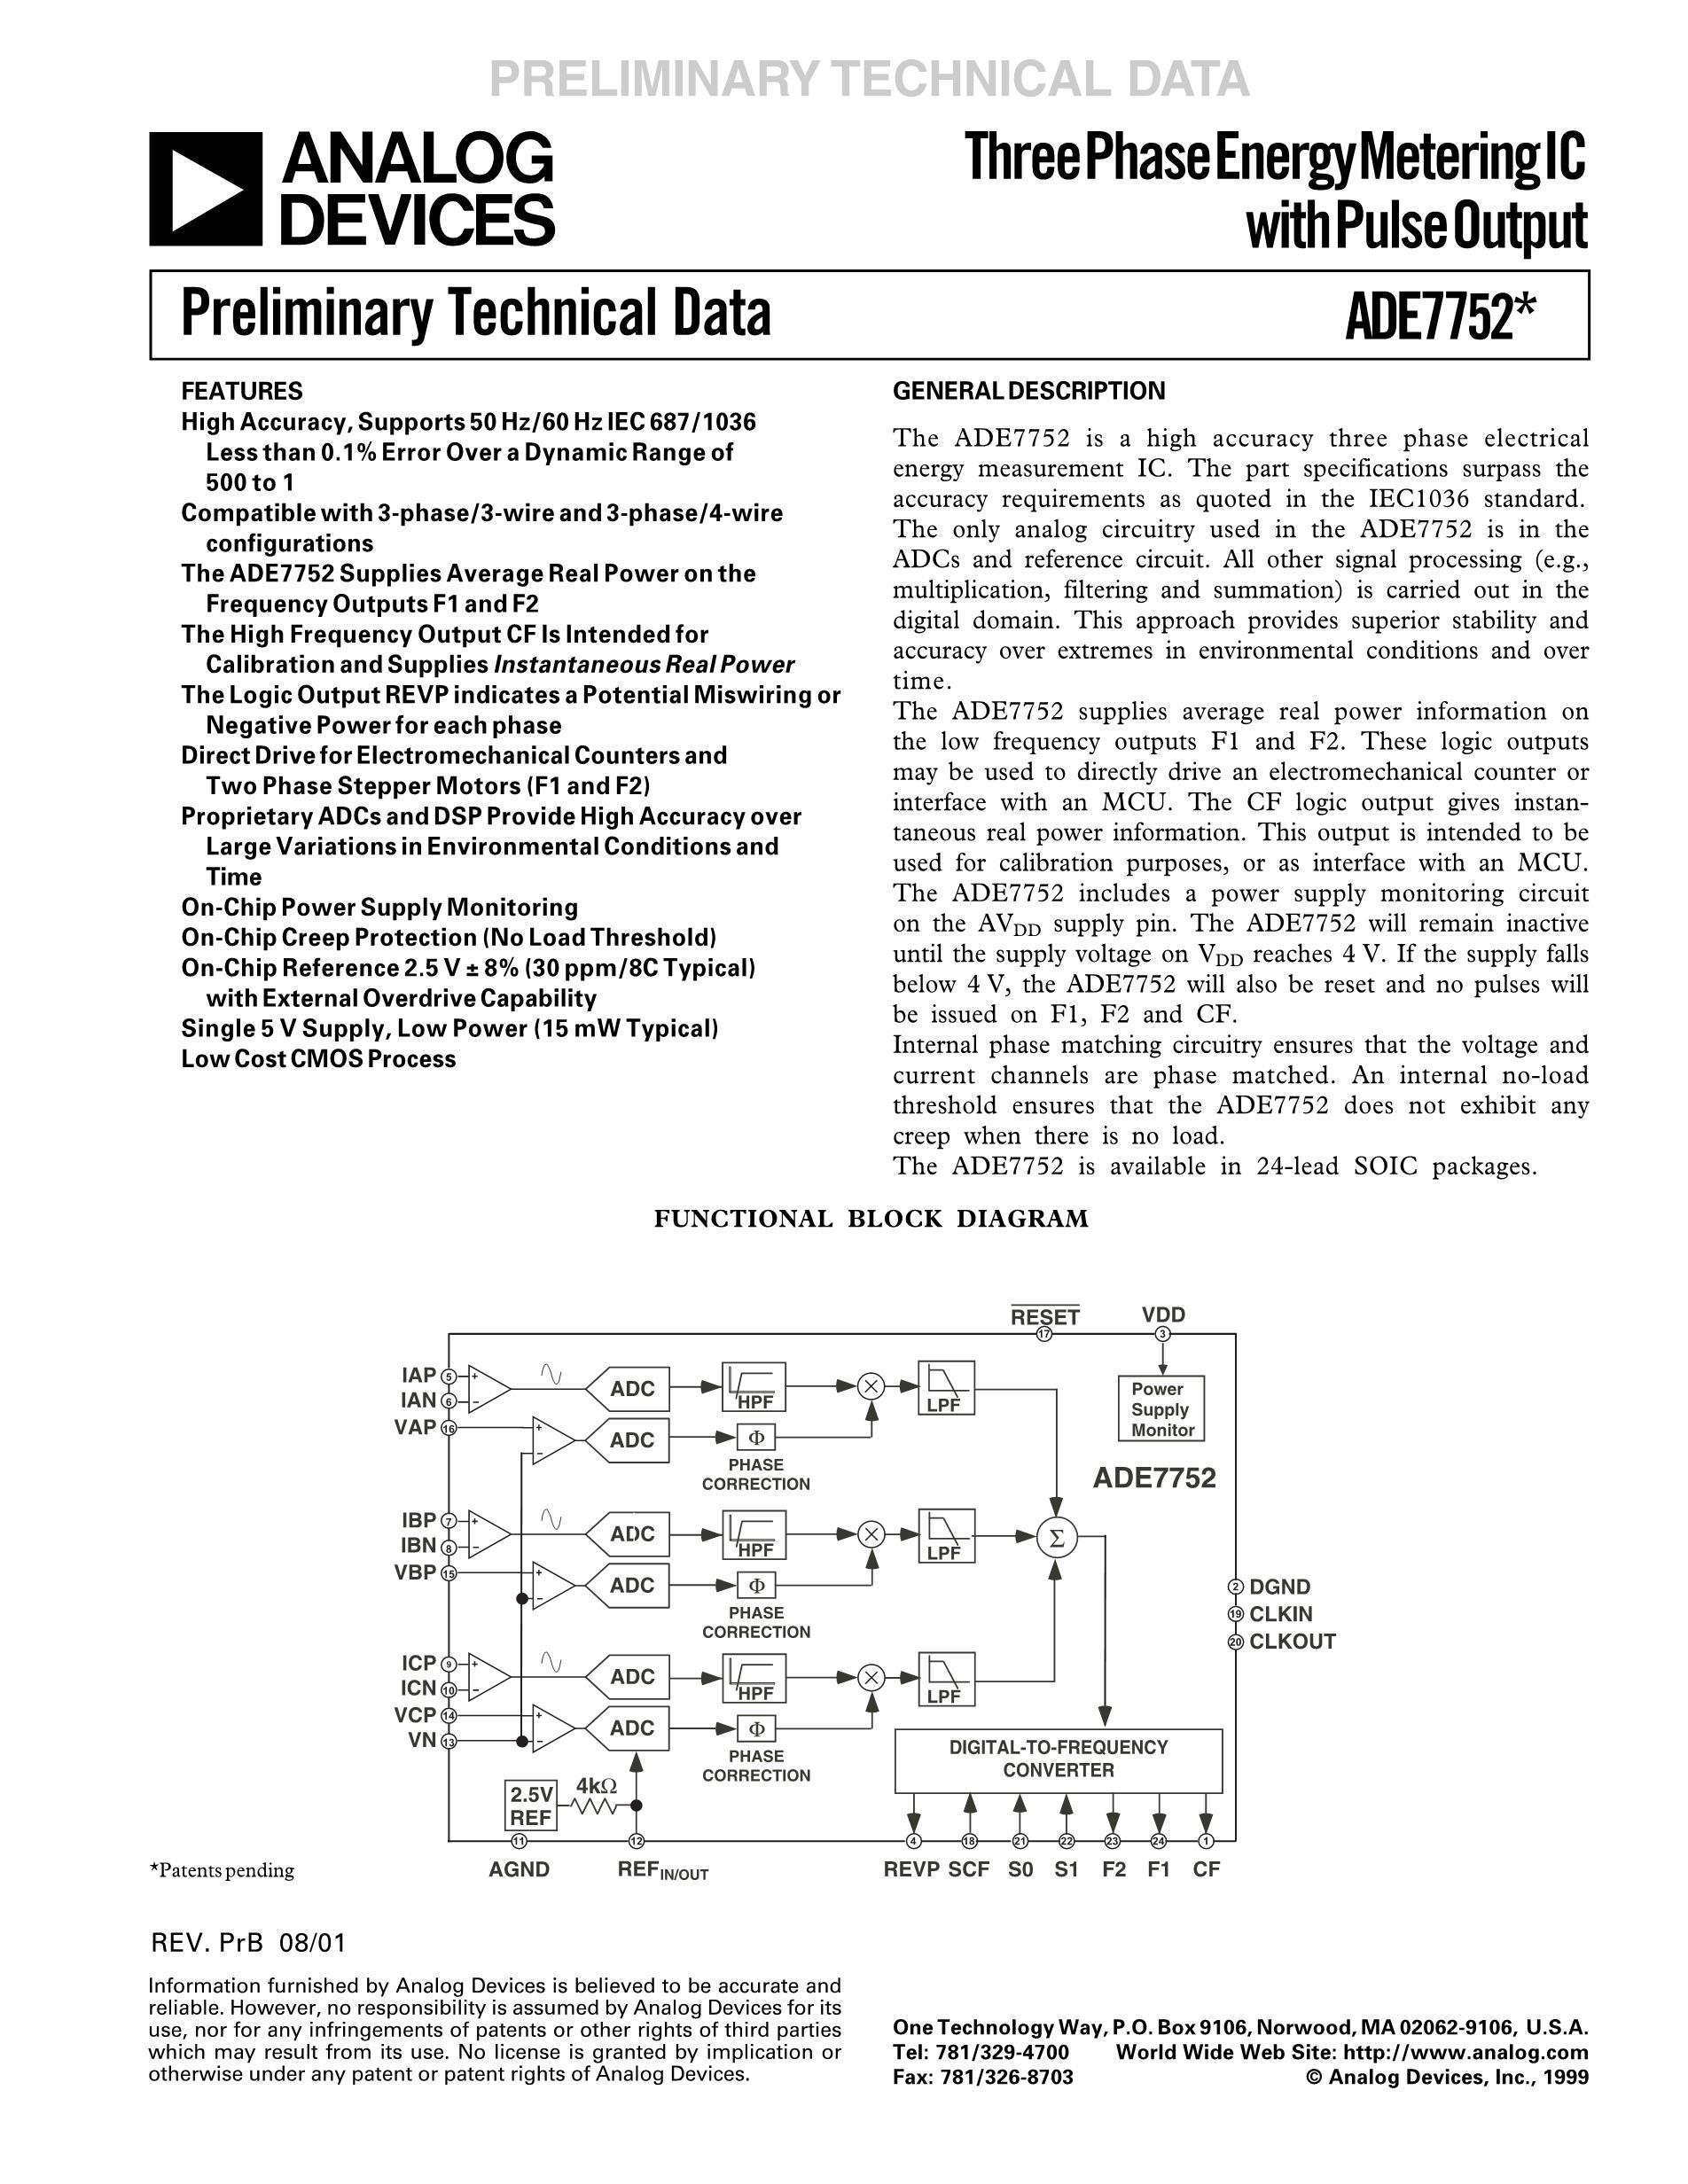 ADE7858ACPZ-RL's pdf picture 1